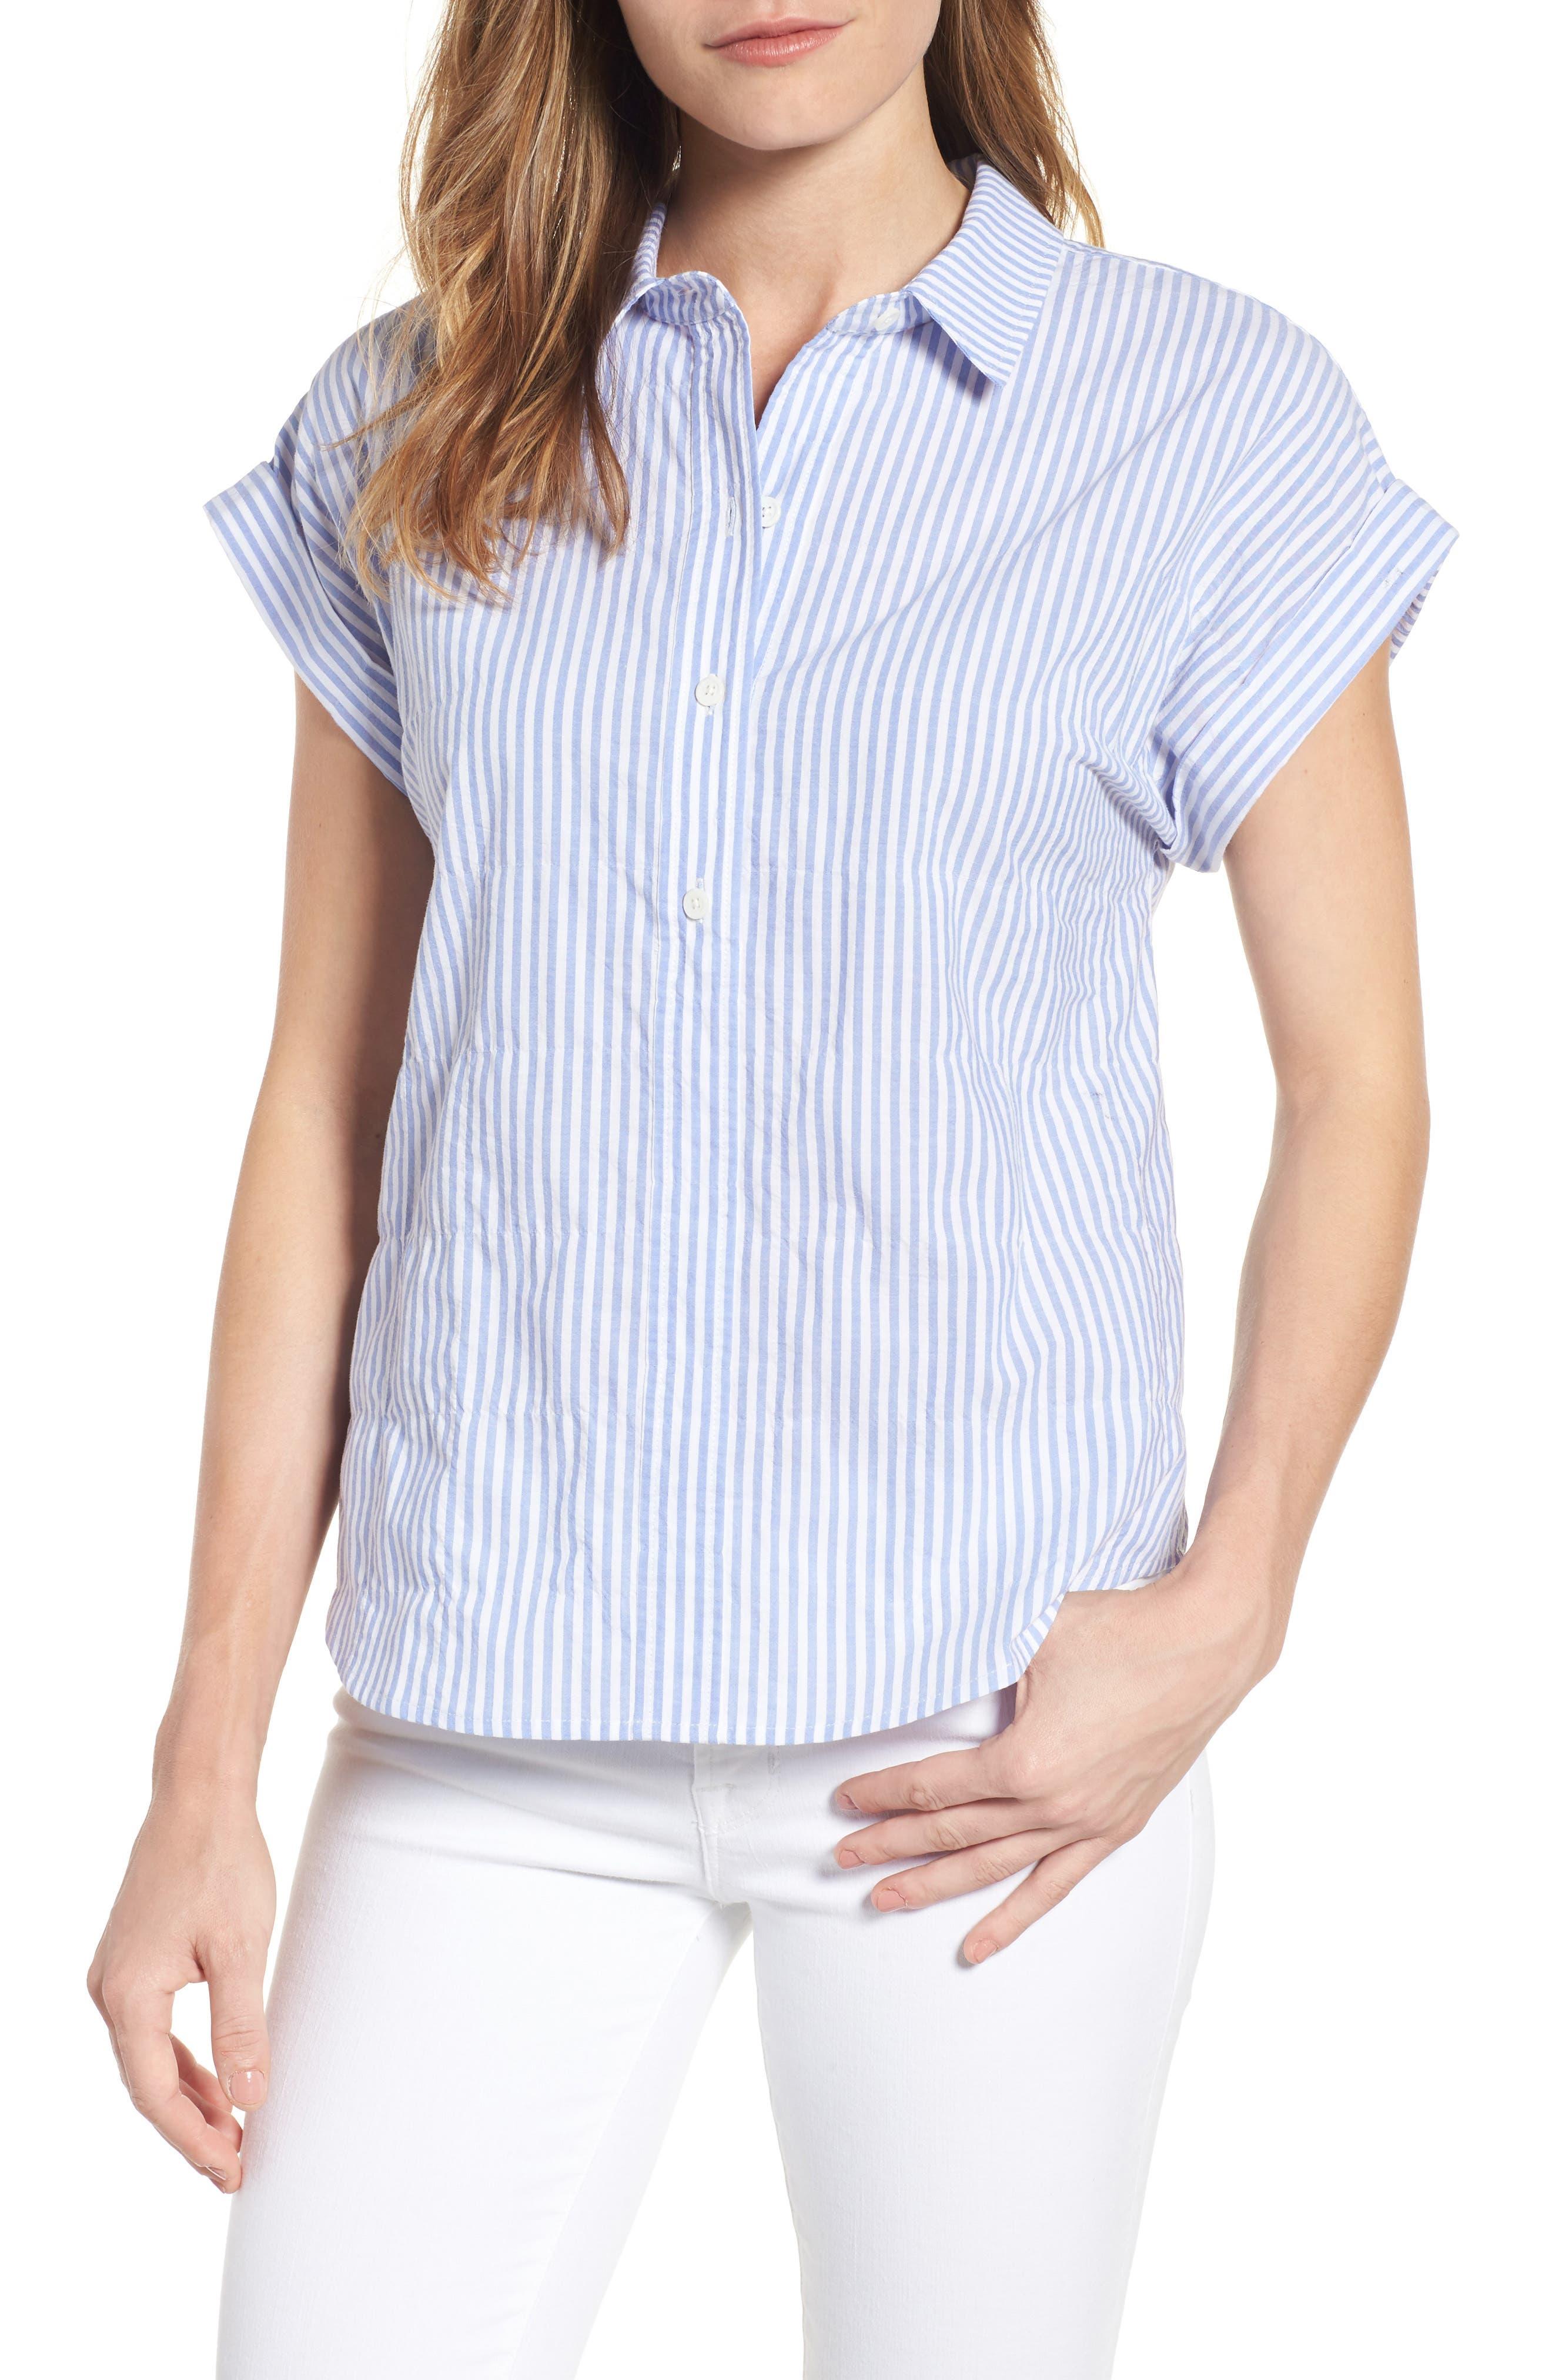 Vineyard Vines Stripe Dolman Sleeve Shirt